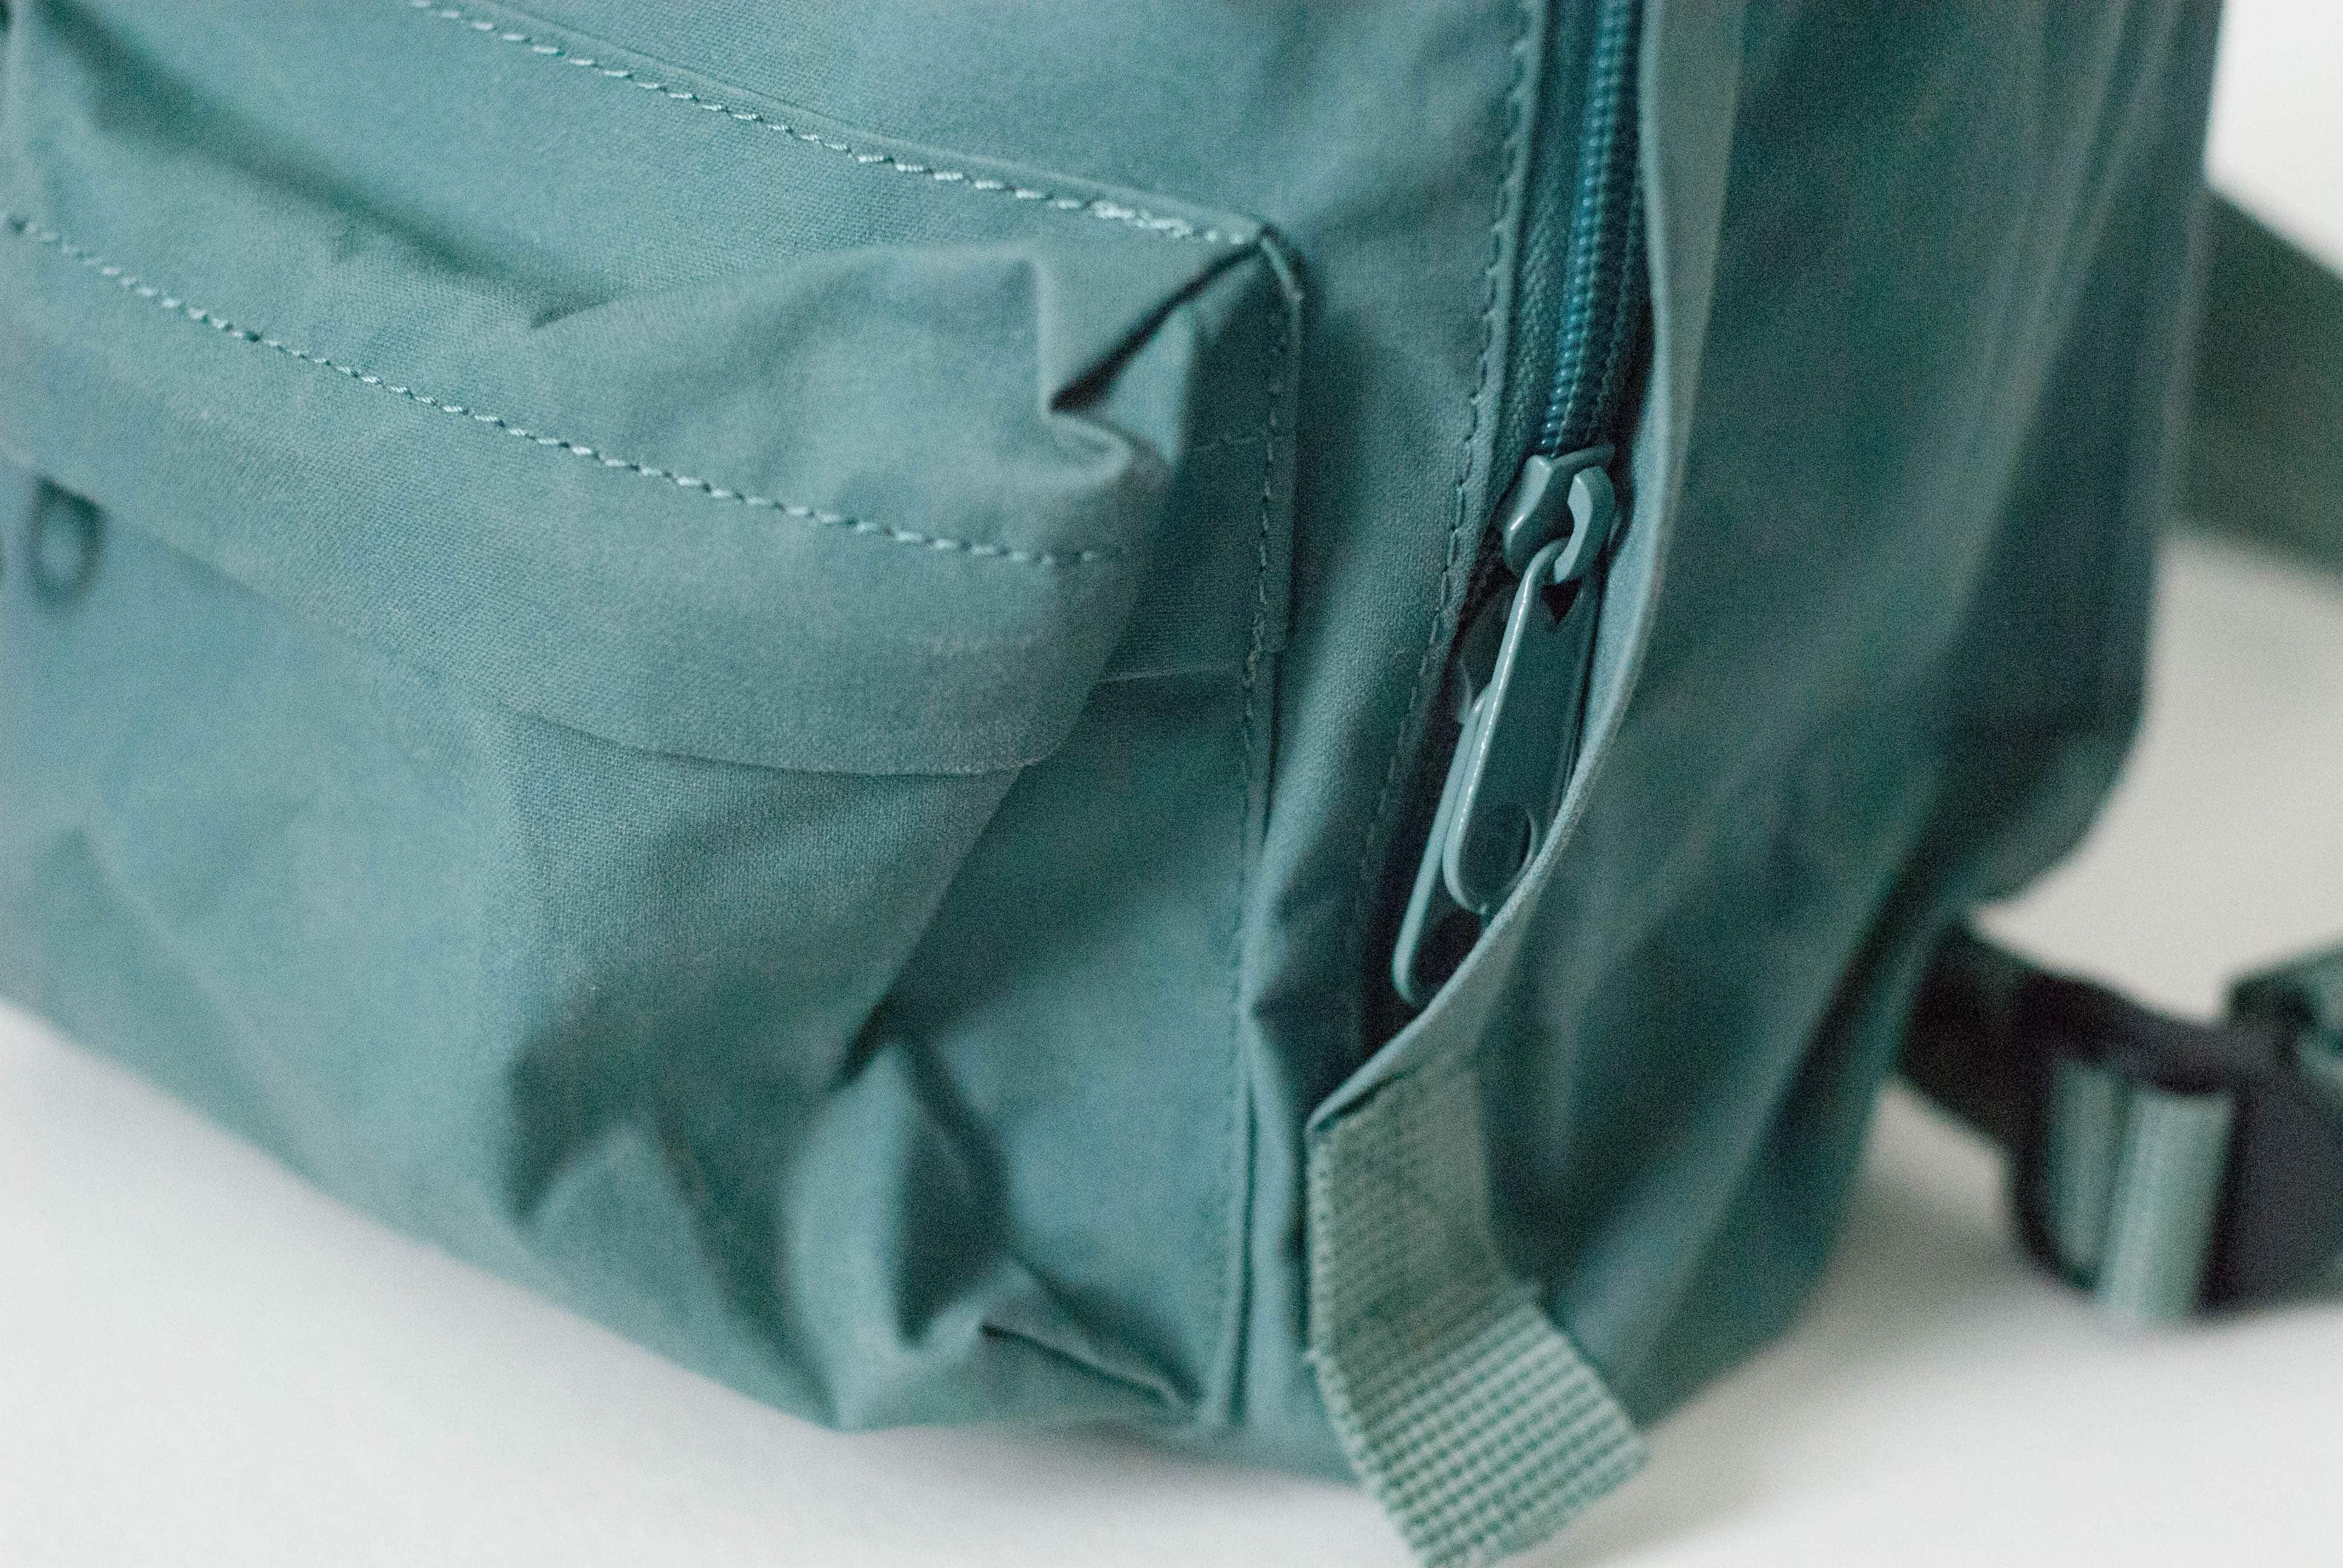 Fjallraven Kanken Mini Zipper and Front Pocket Detail